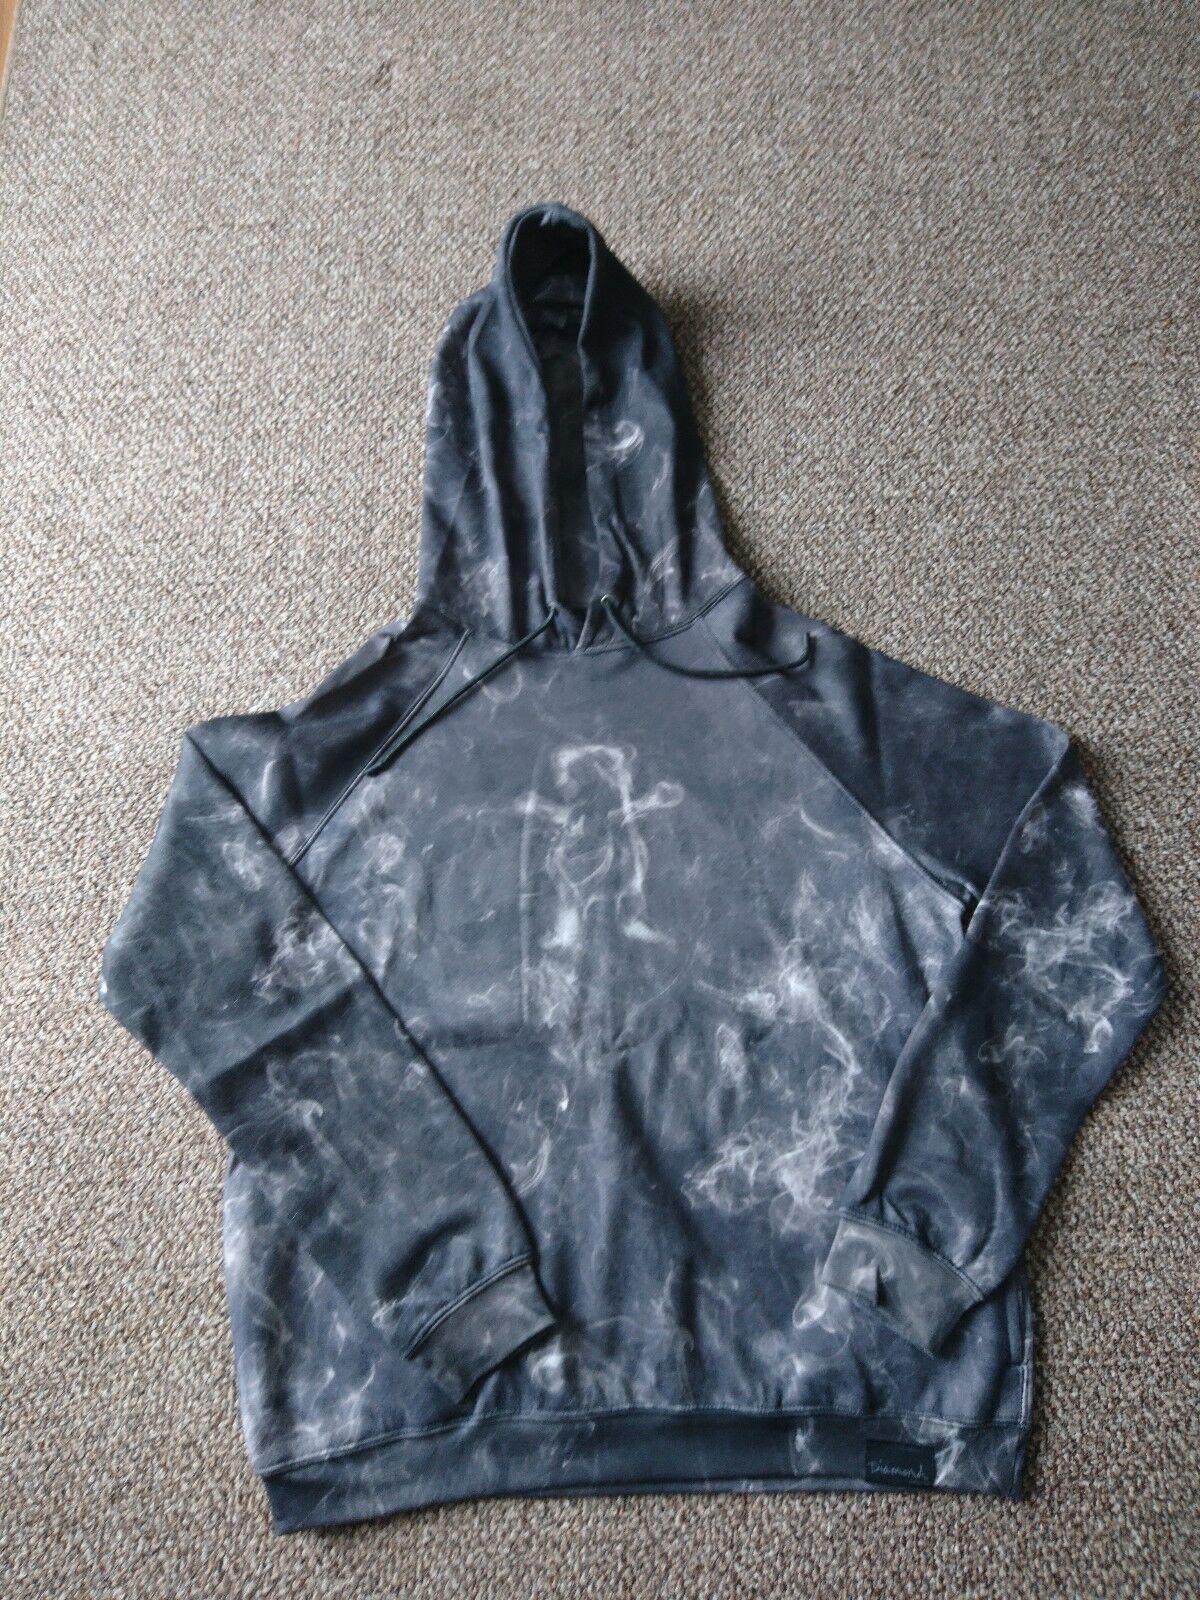 61cd9c4667476 Diamond Supply Co Smoke Sublimated Bear VVS Grizzly Griptape Hoodie Large